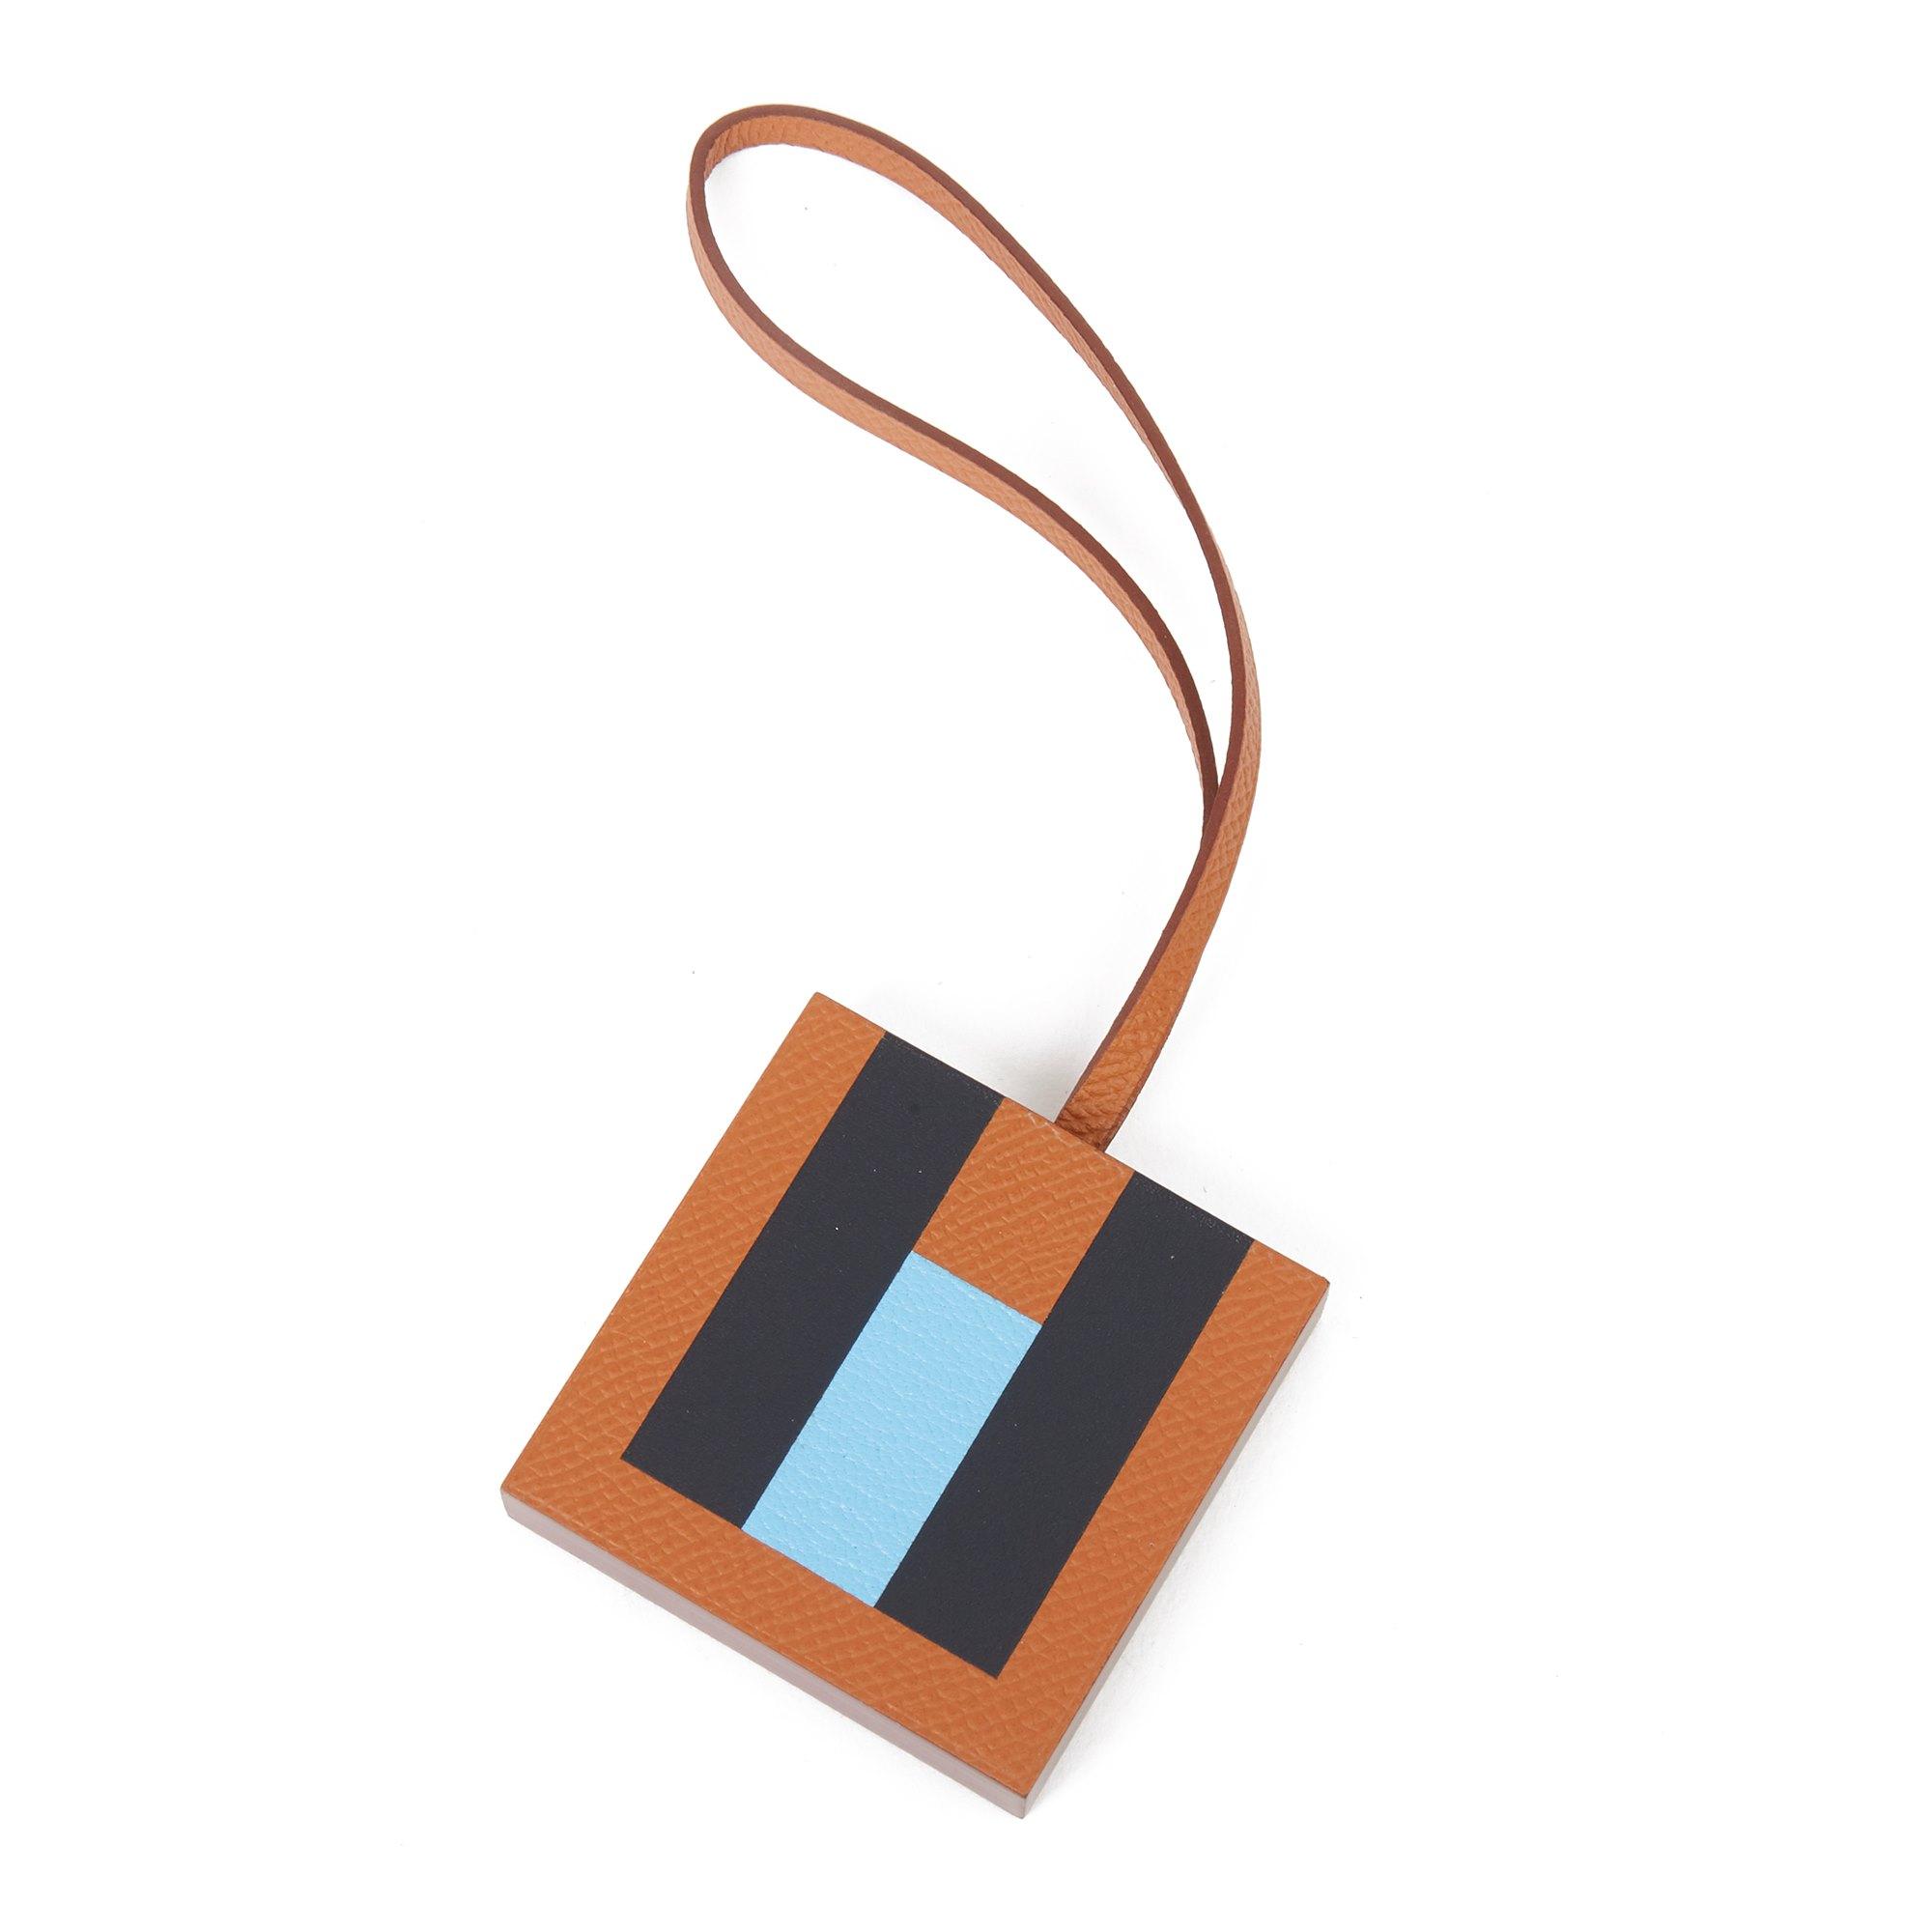 Hermès Gold Epsom Leather, Celeste Chevre Mysore Leather & Bleu Obscur Sombrero Leather 'H' Lettre Charm